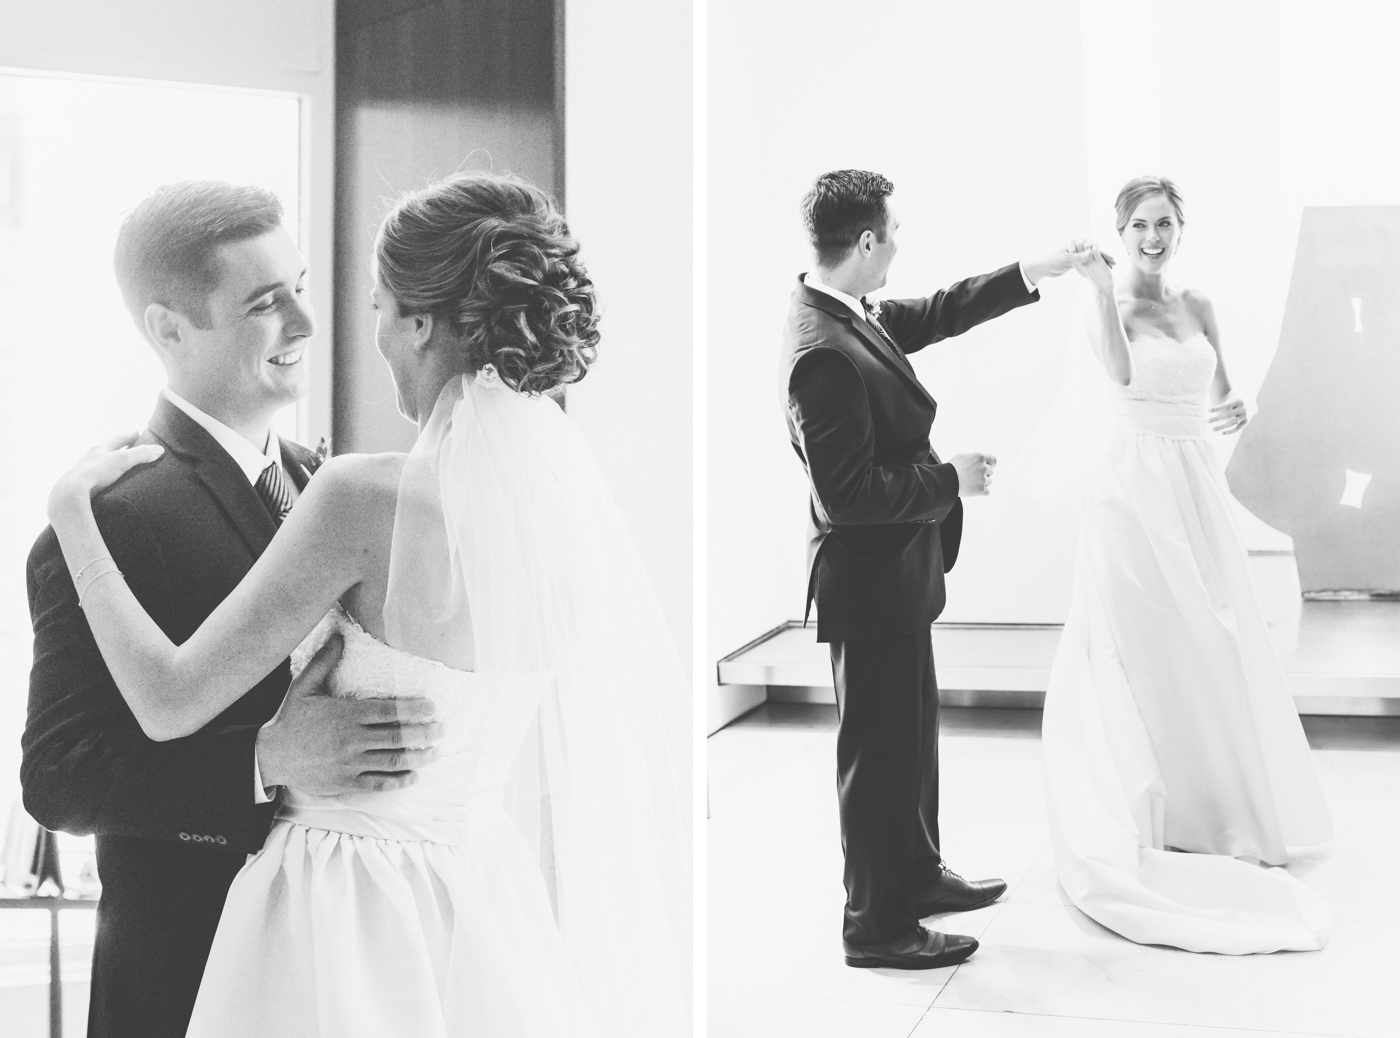 chicago-fine-art-wedding-photography-blais52